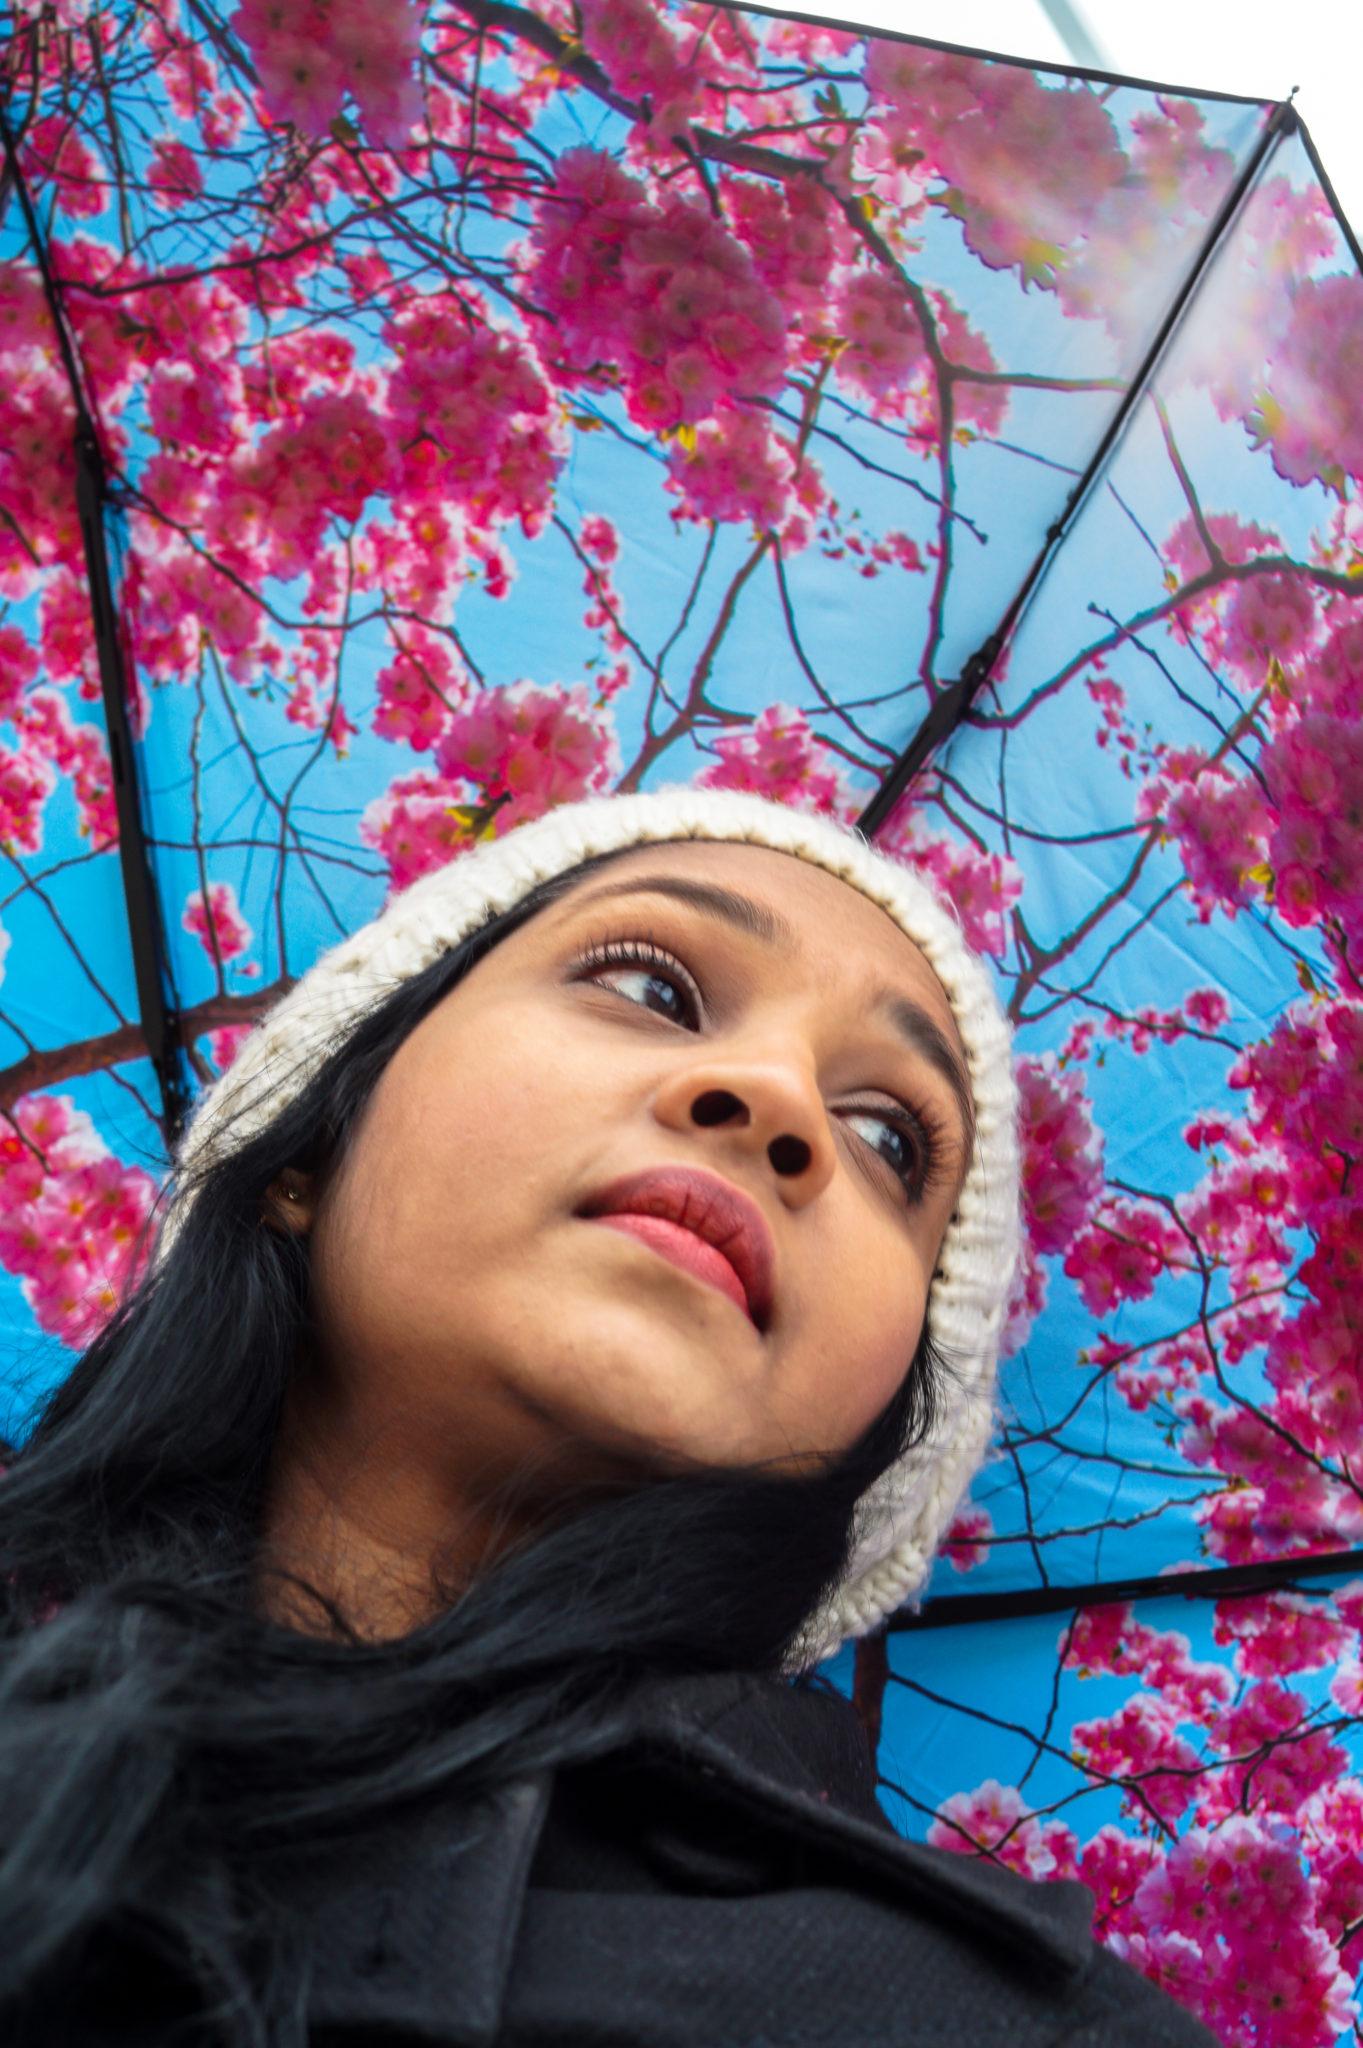 Hemaposesesvalises_Happysweeds_Cherry_Umbrella_blog_mode